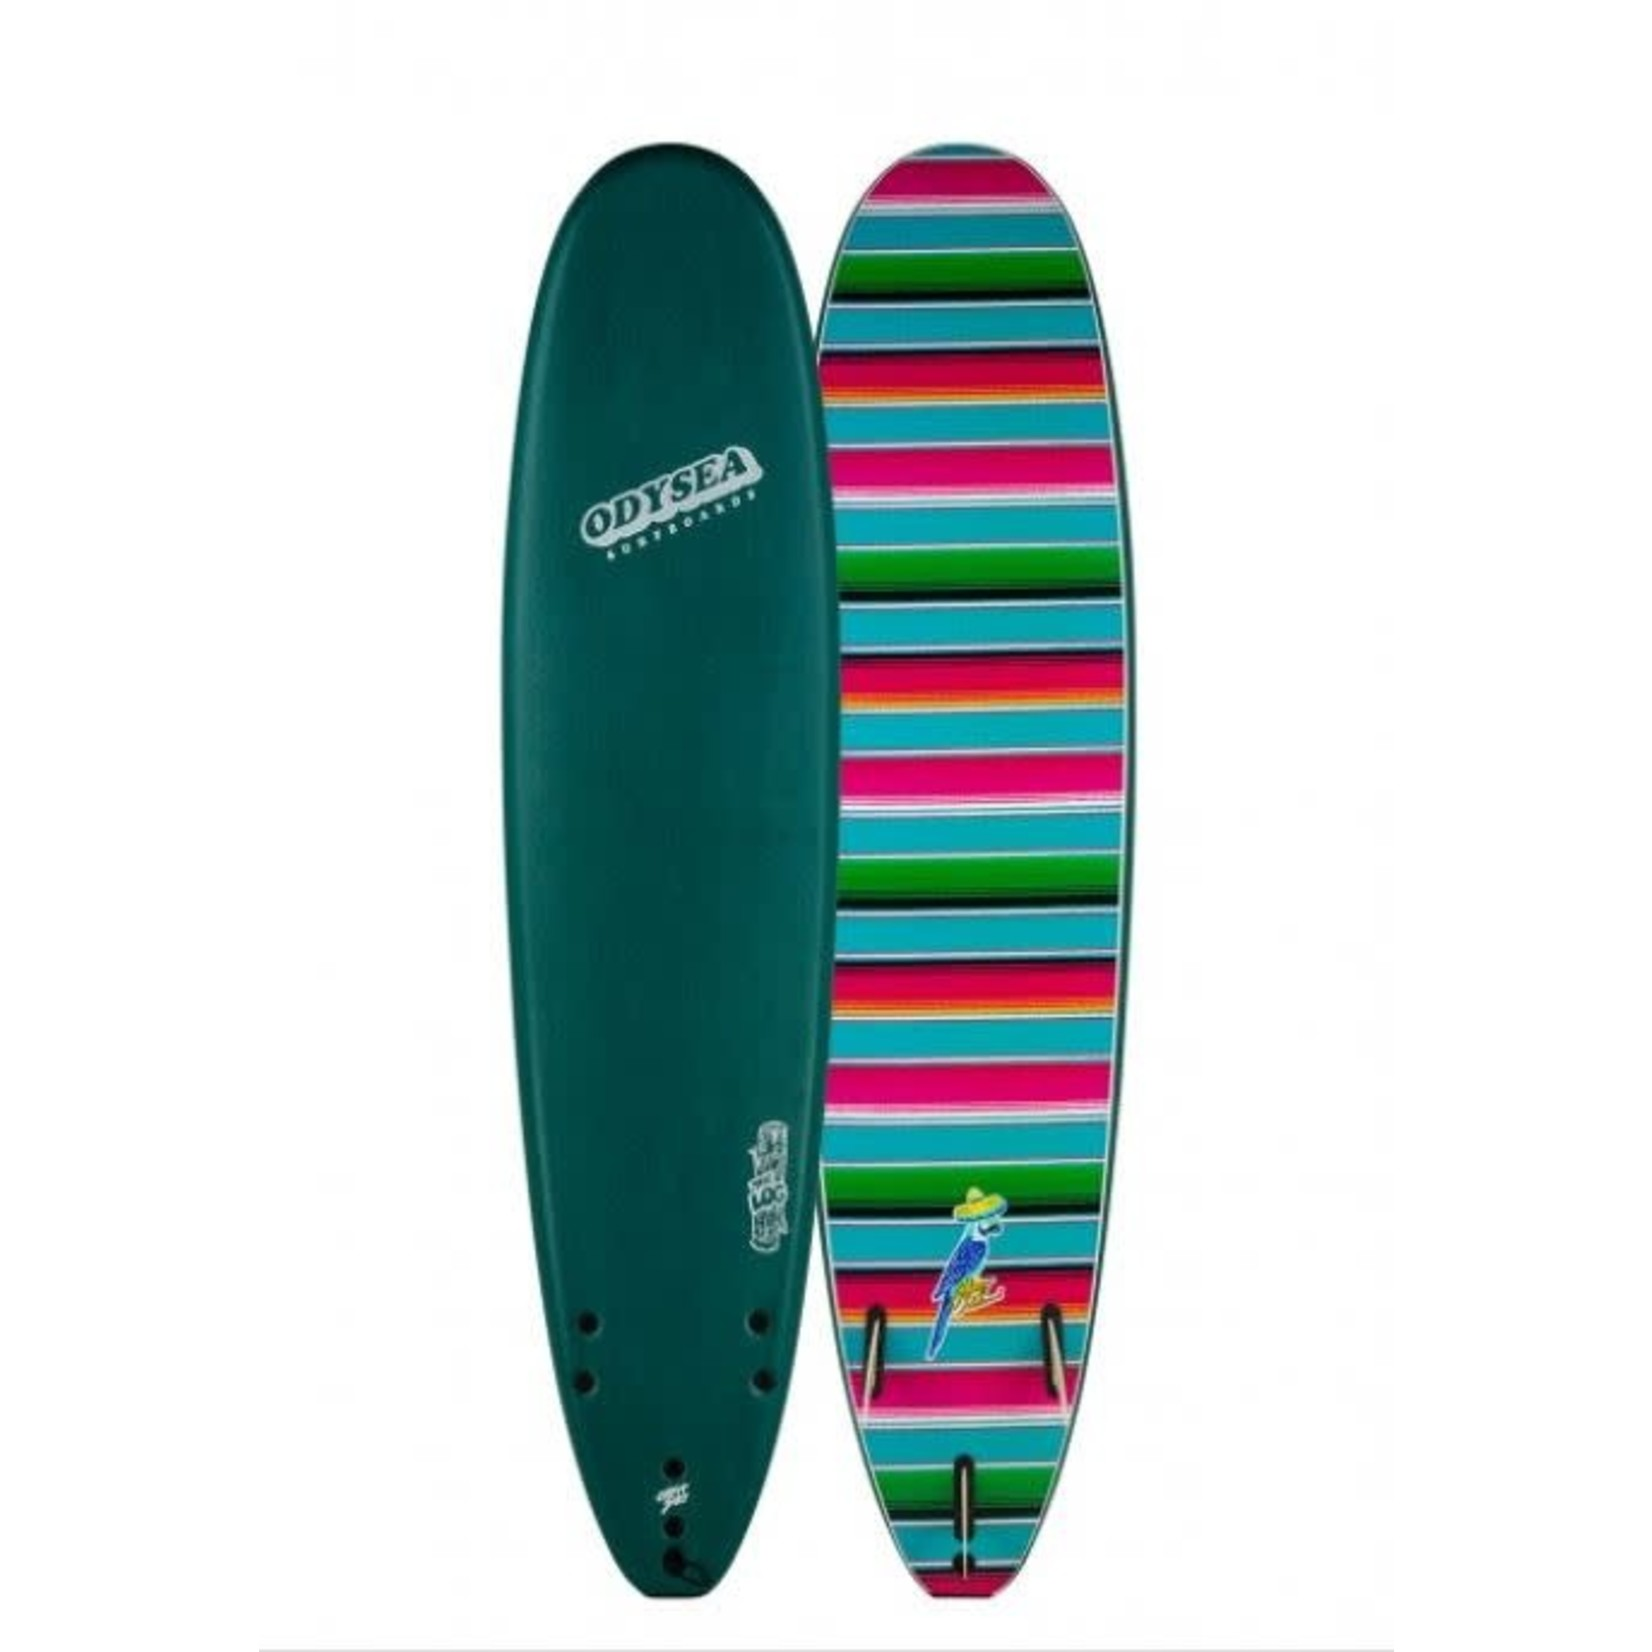 Catch Surf ODYSEA 8.0 LOG JOHNNY REDMOND